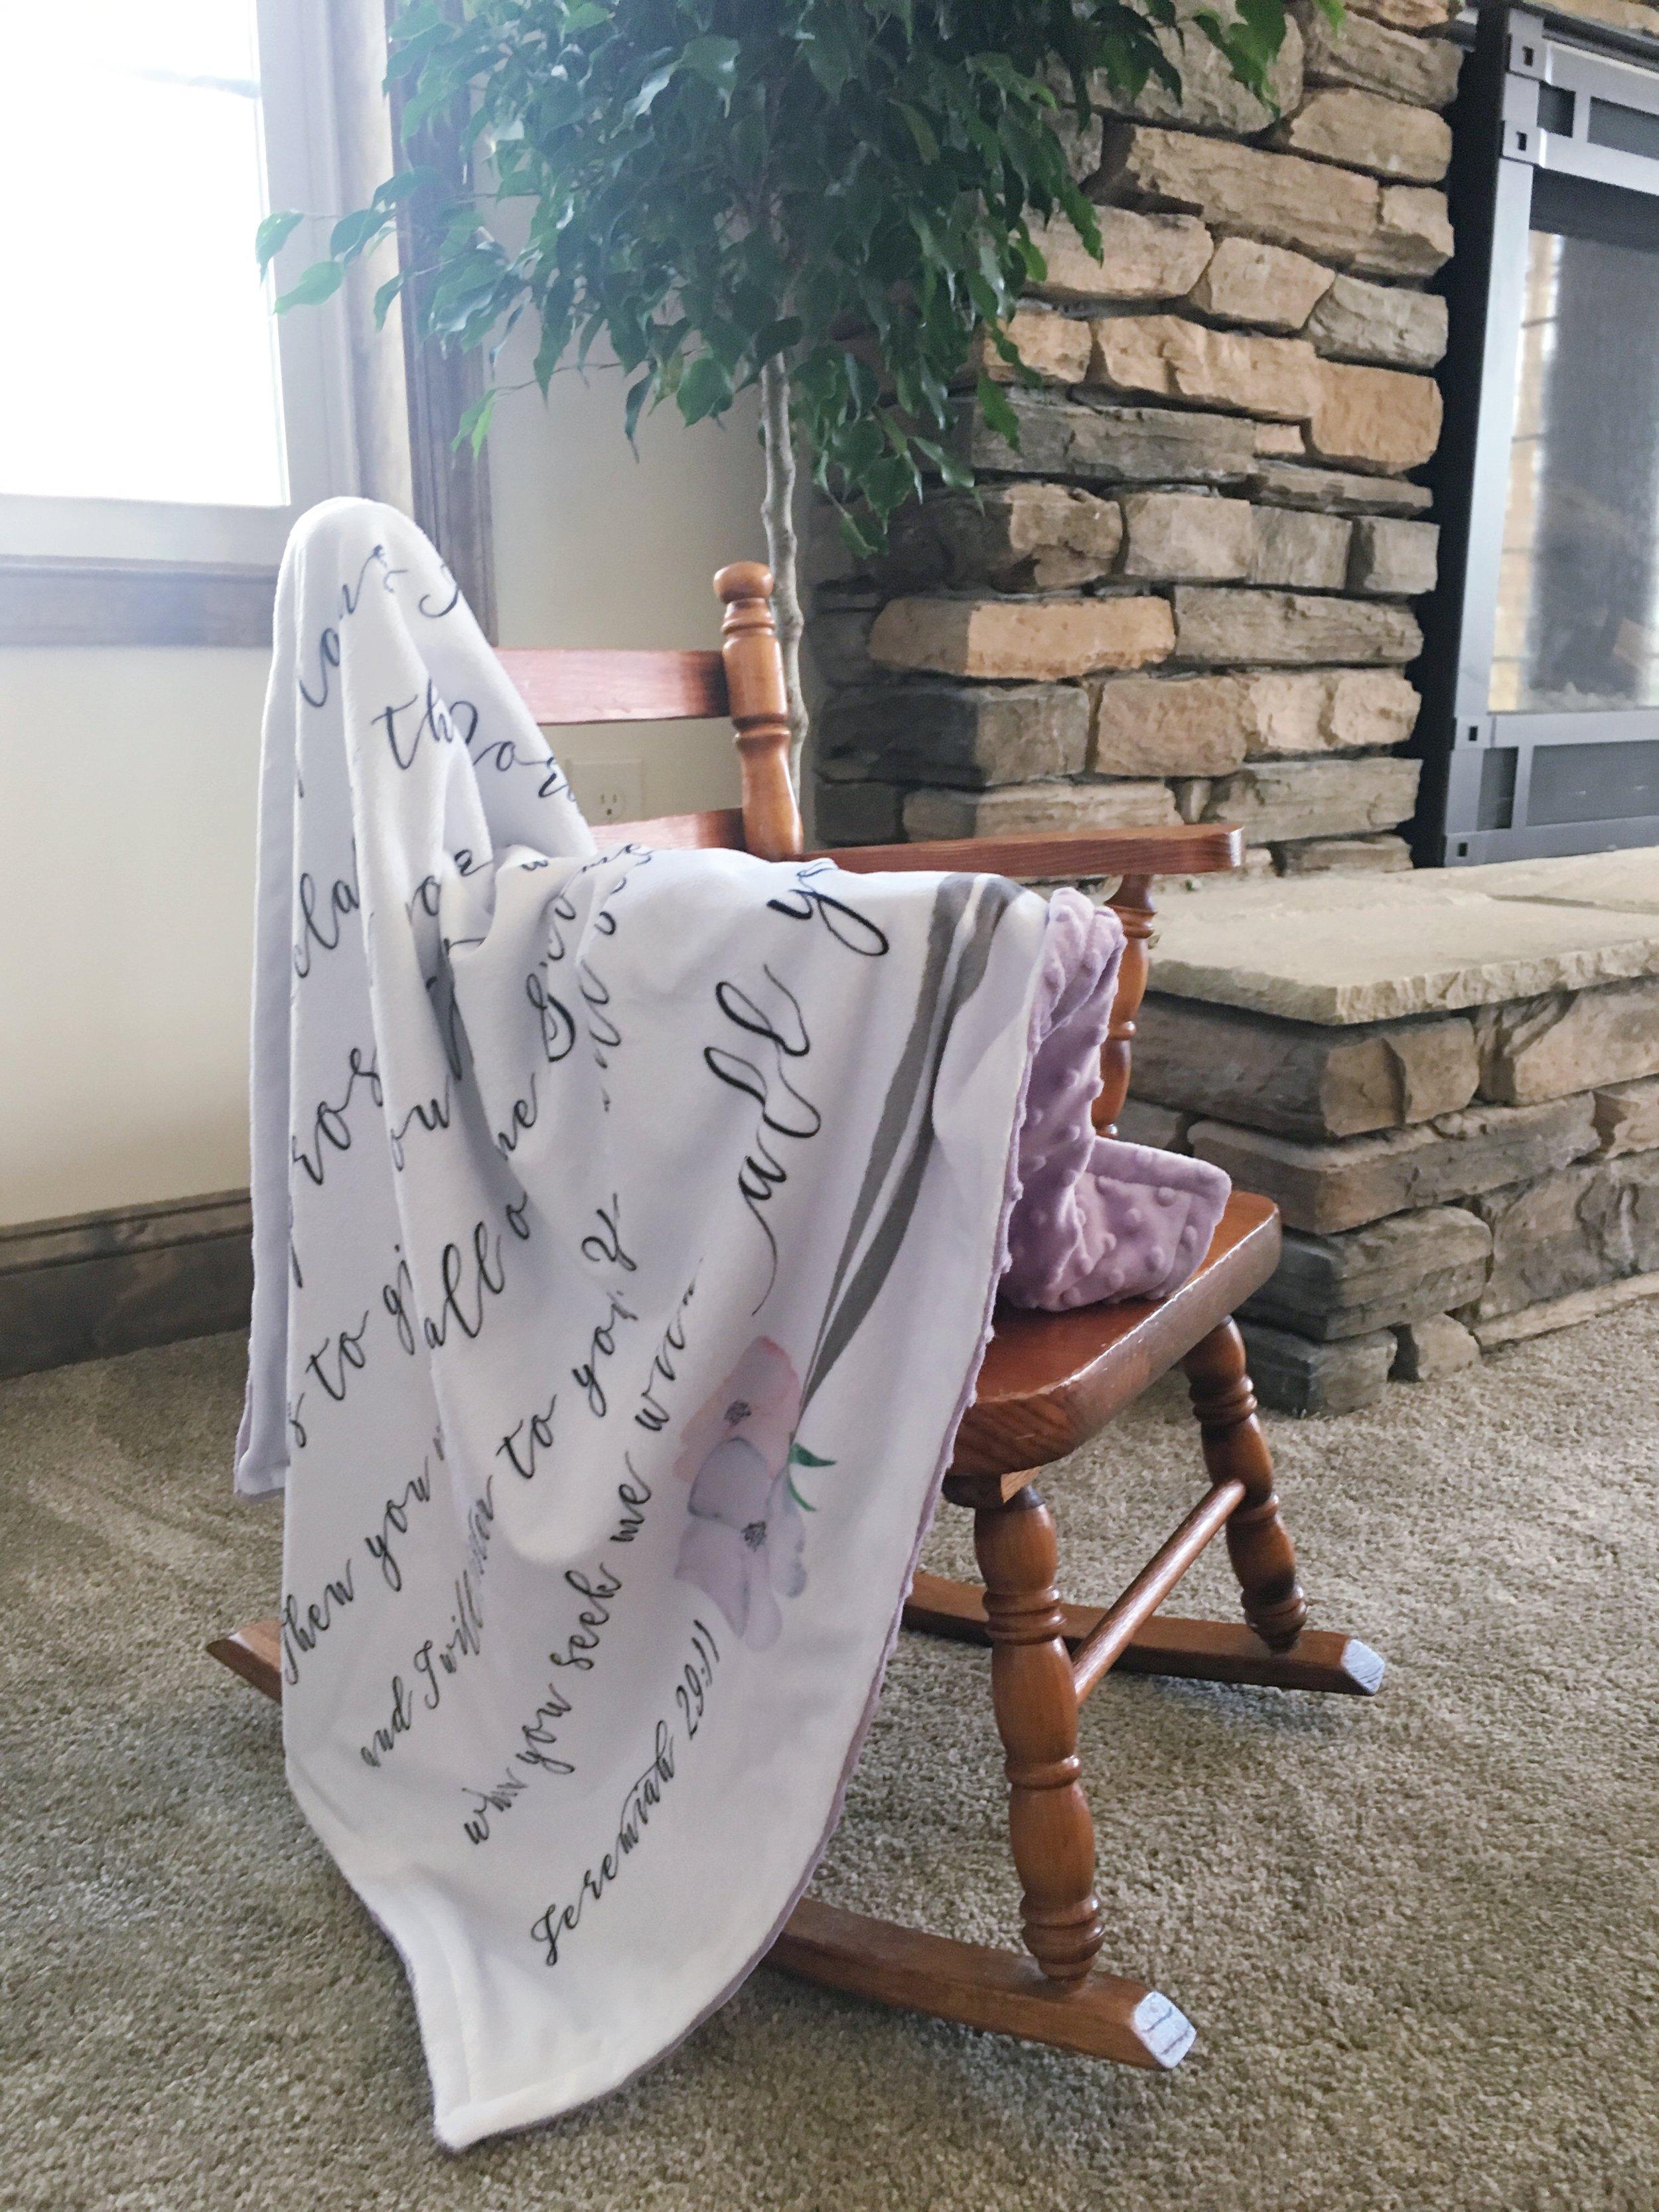 Central PA, Baby Blanket, Hand lettered, JesSmith Designs, Invitations, custom-04-15 06.26.18.jpg